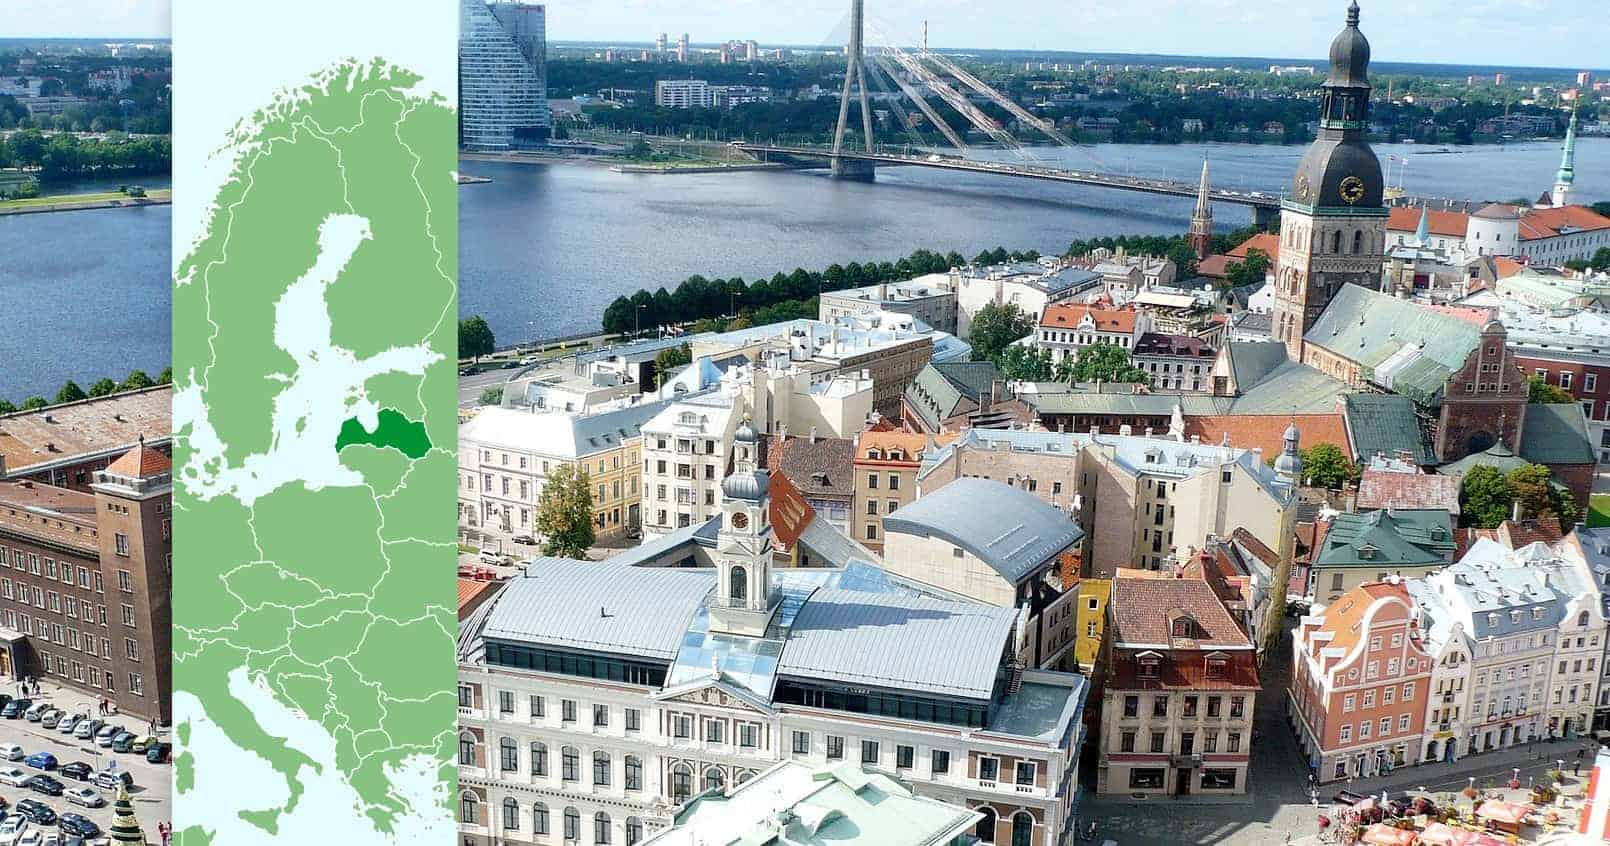 Riga, Latvia, reisdit.no